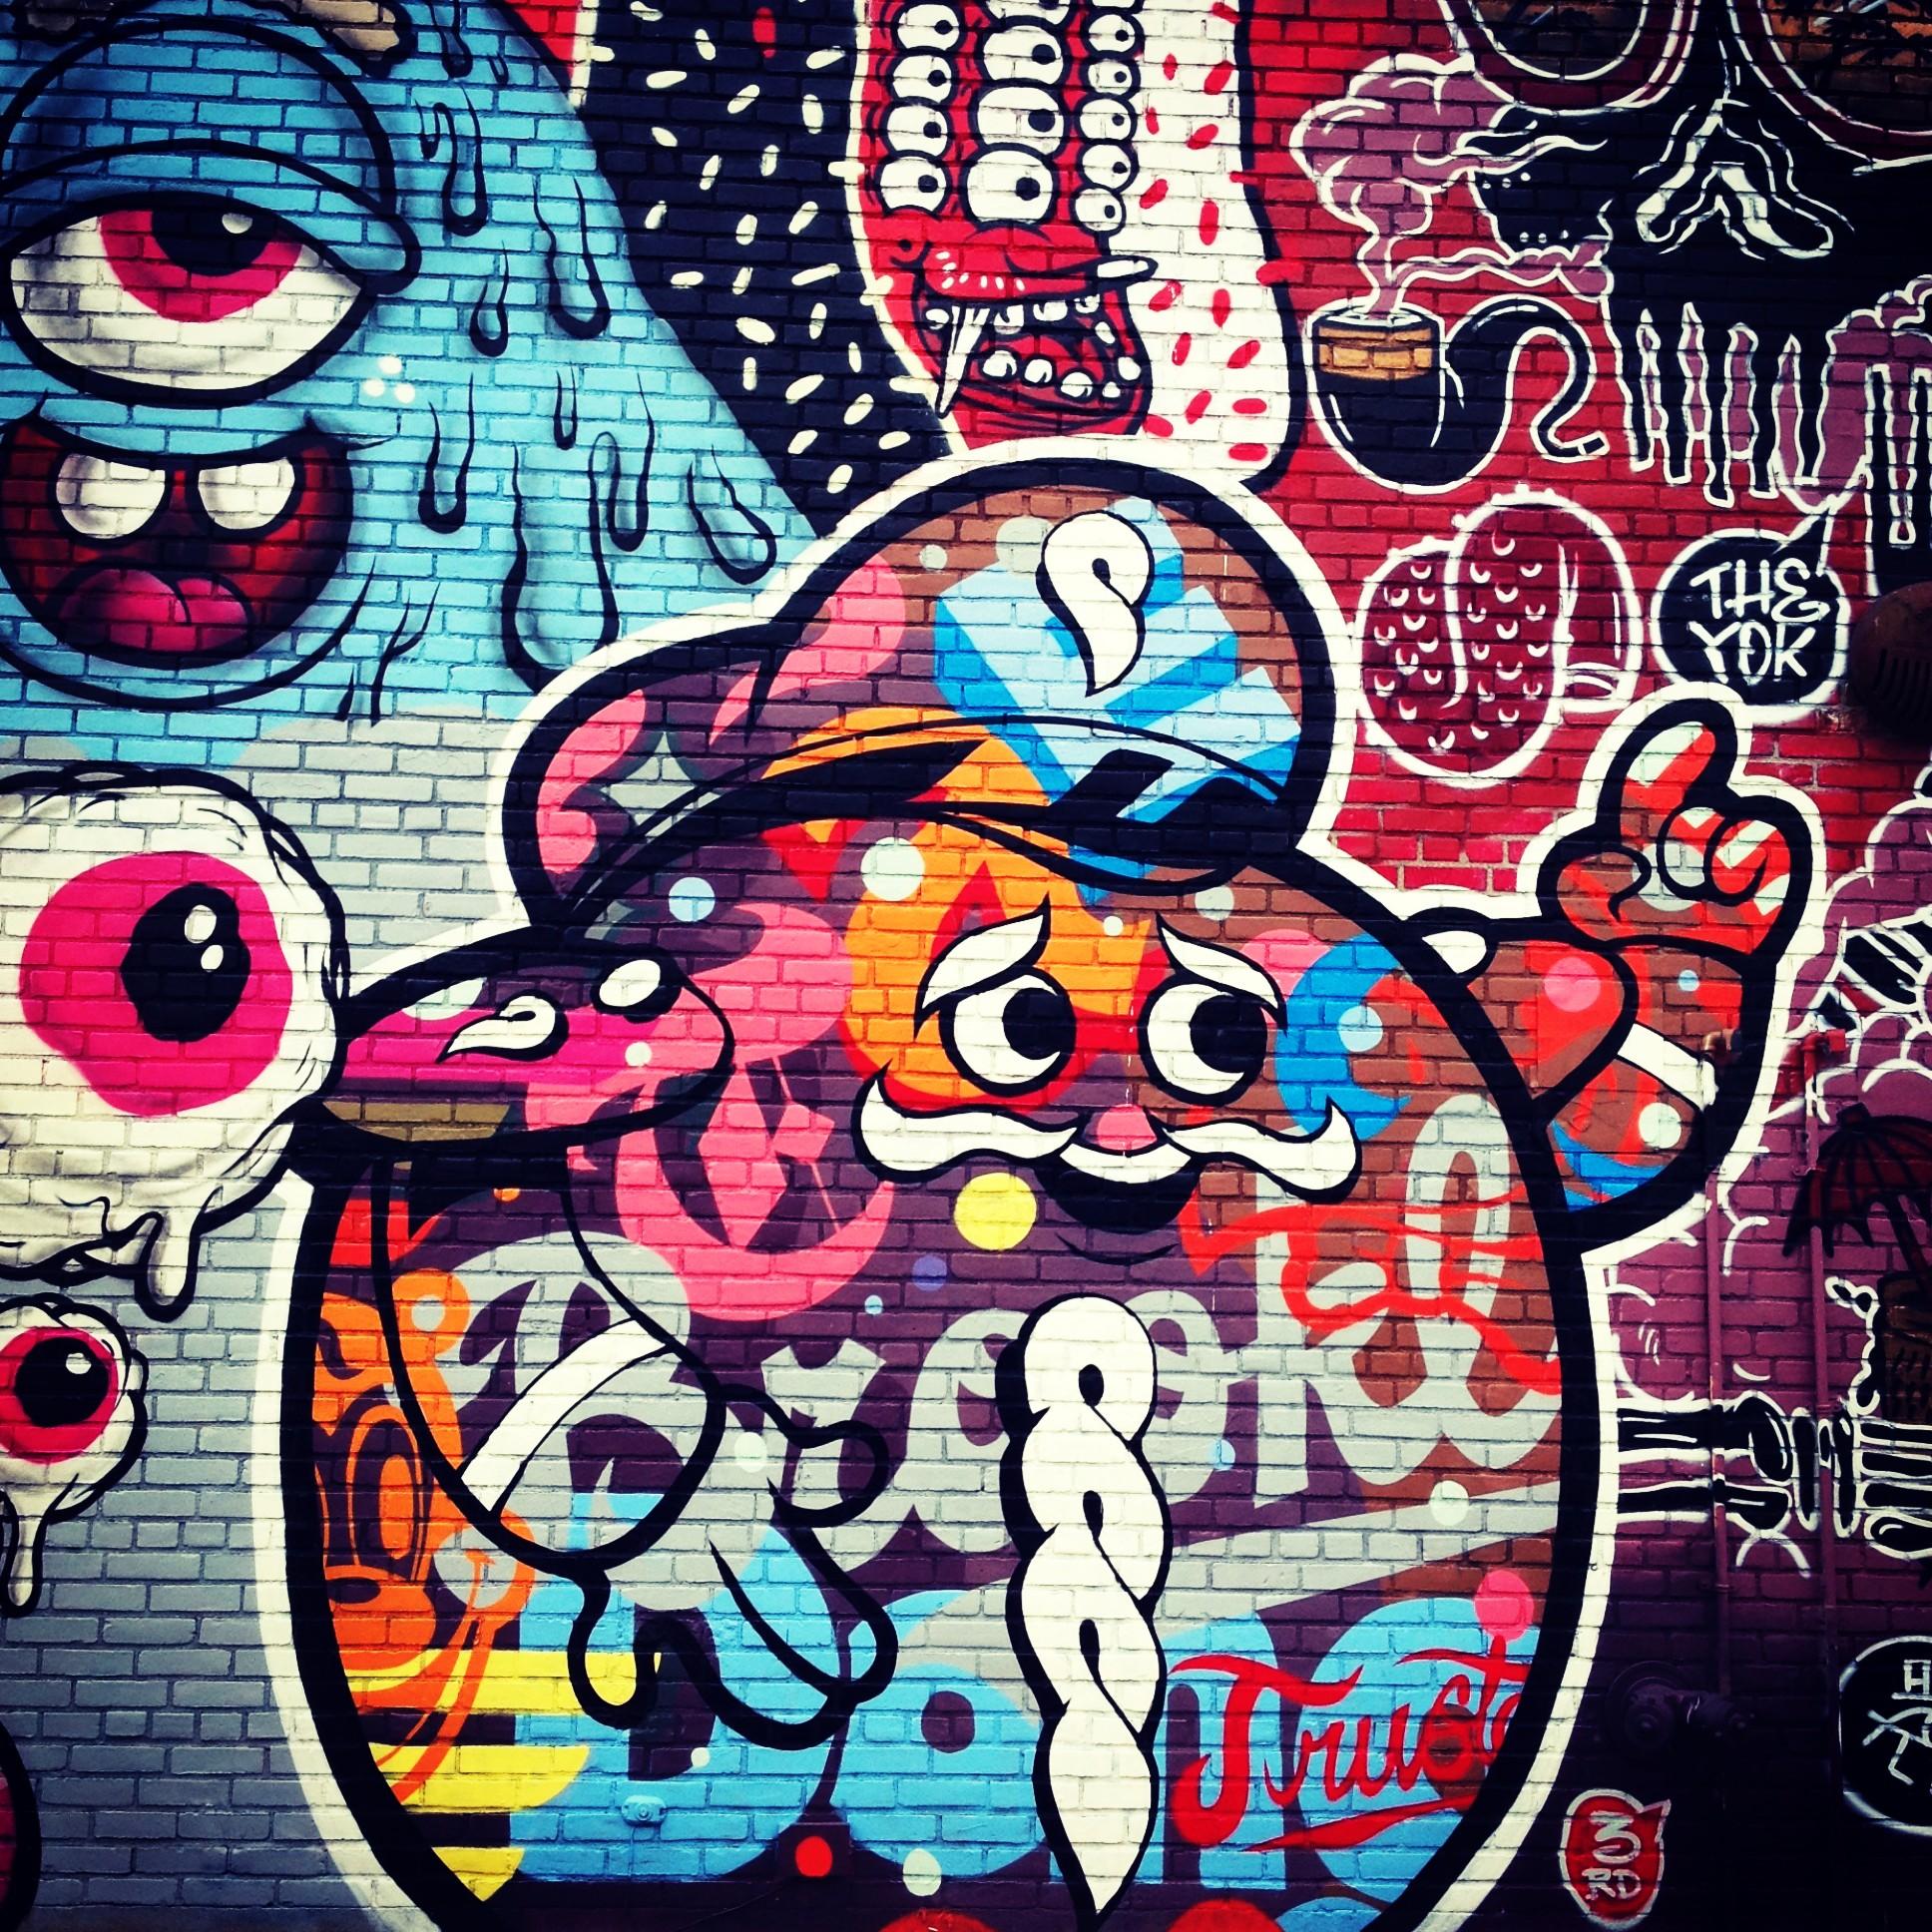 Nyc Graffiti Buff Monster Sheryo And The Yok Tokidoki Nomad